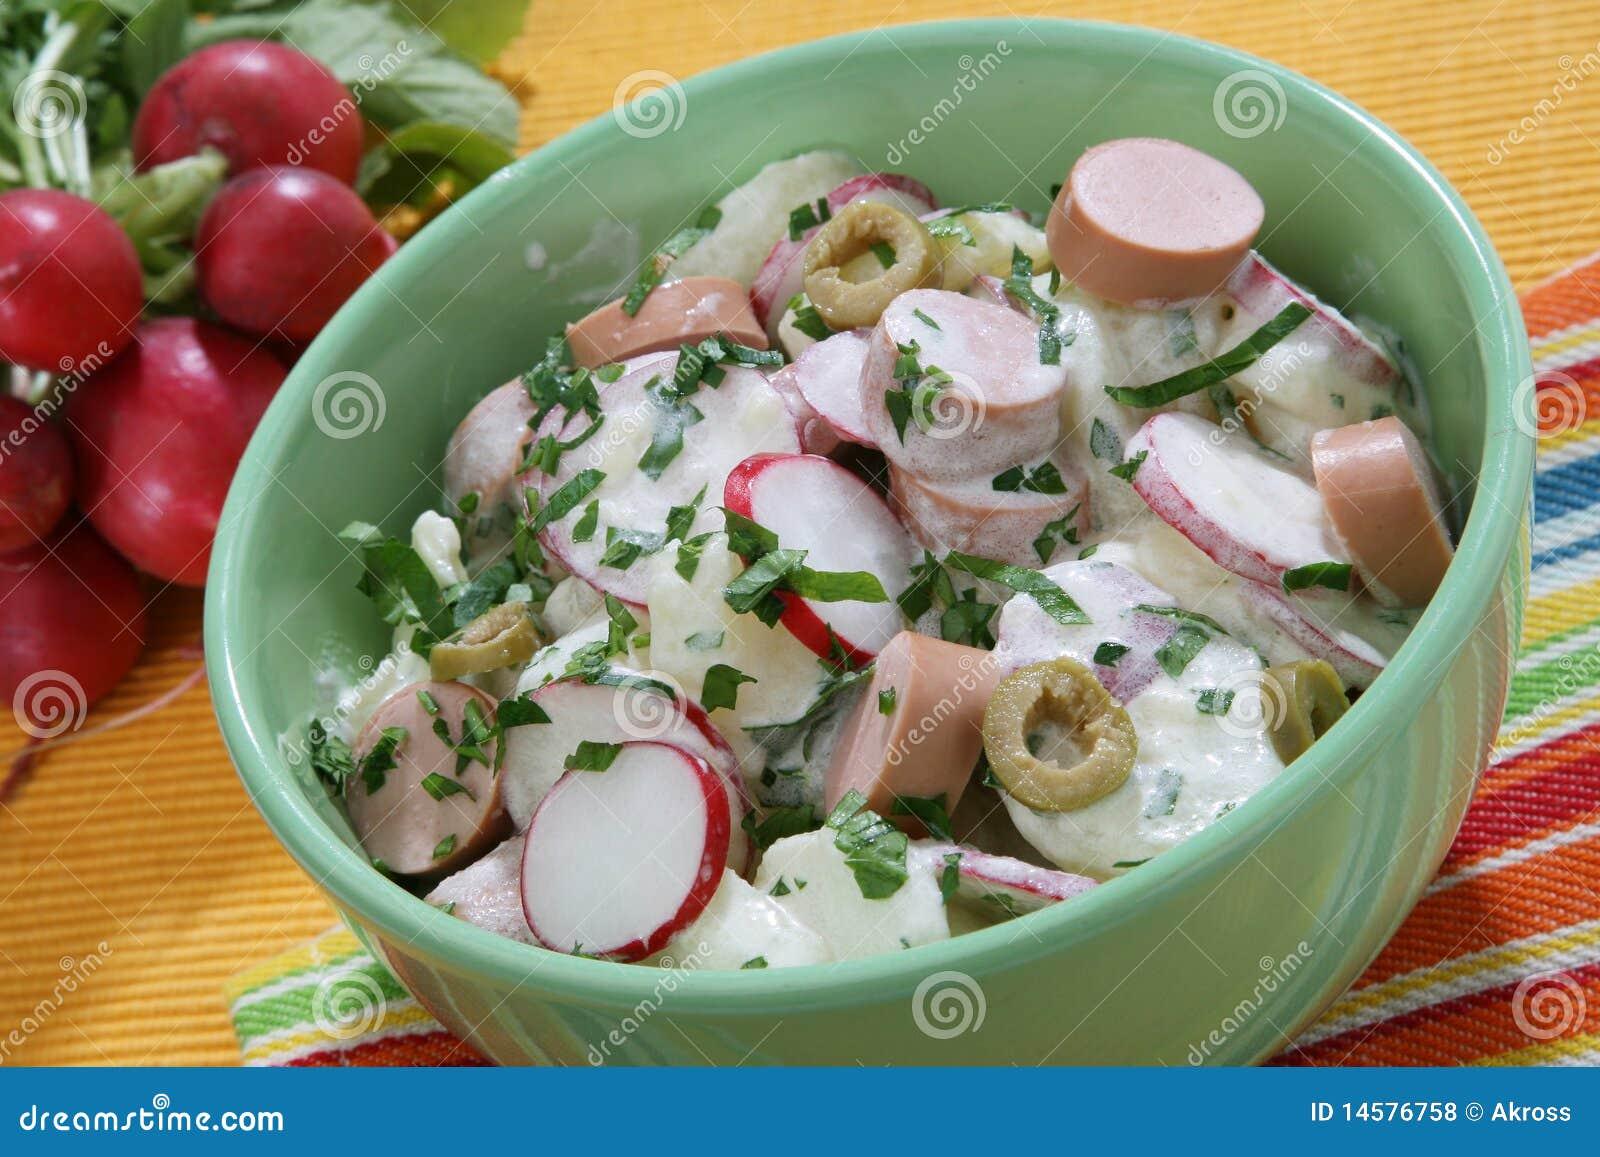 Royalty Free Stock Photos: Fresh summer salad with frankfurter sausage